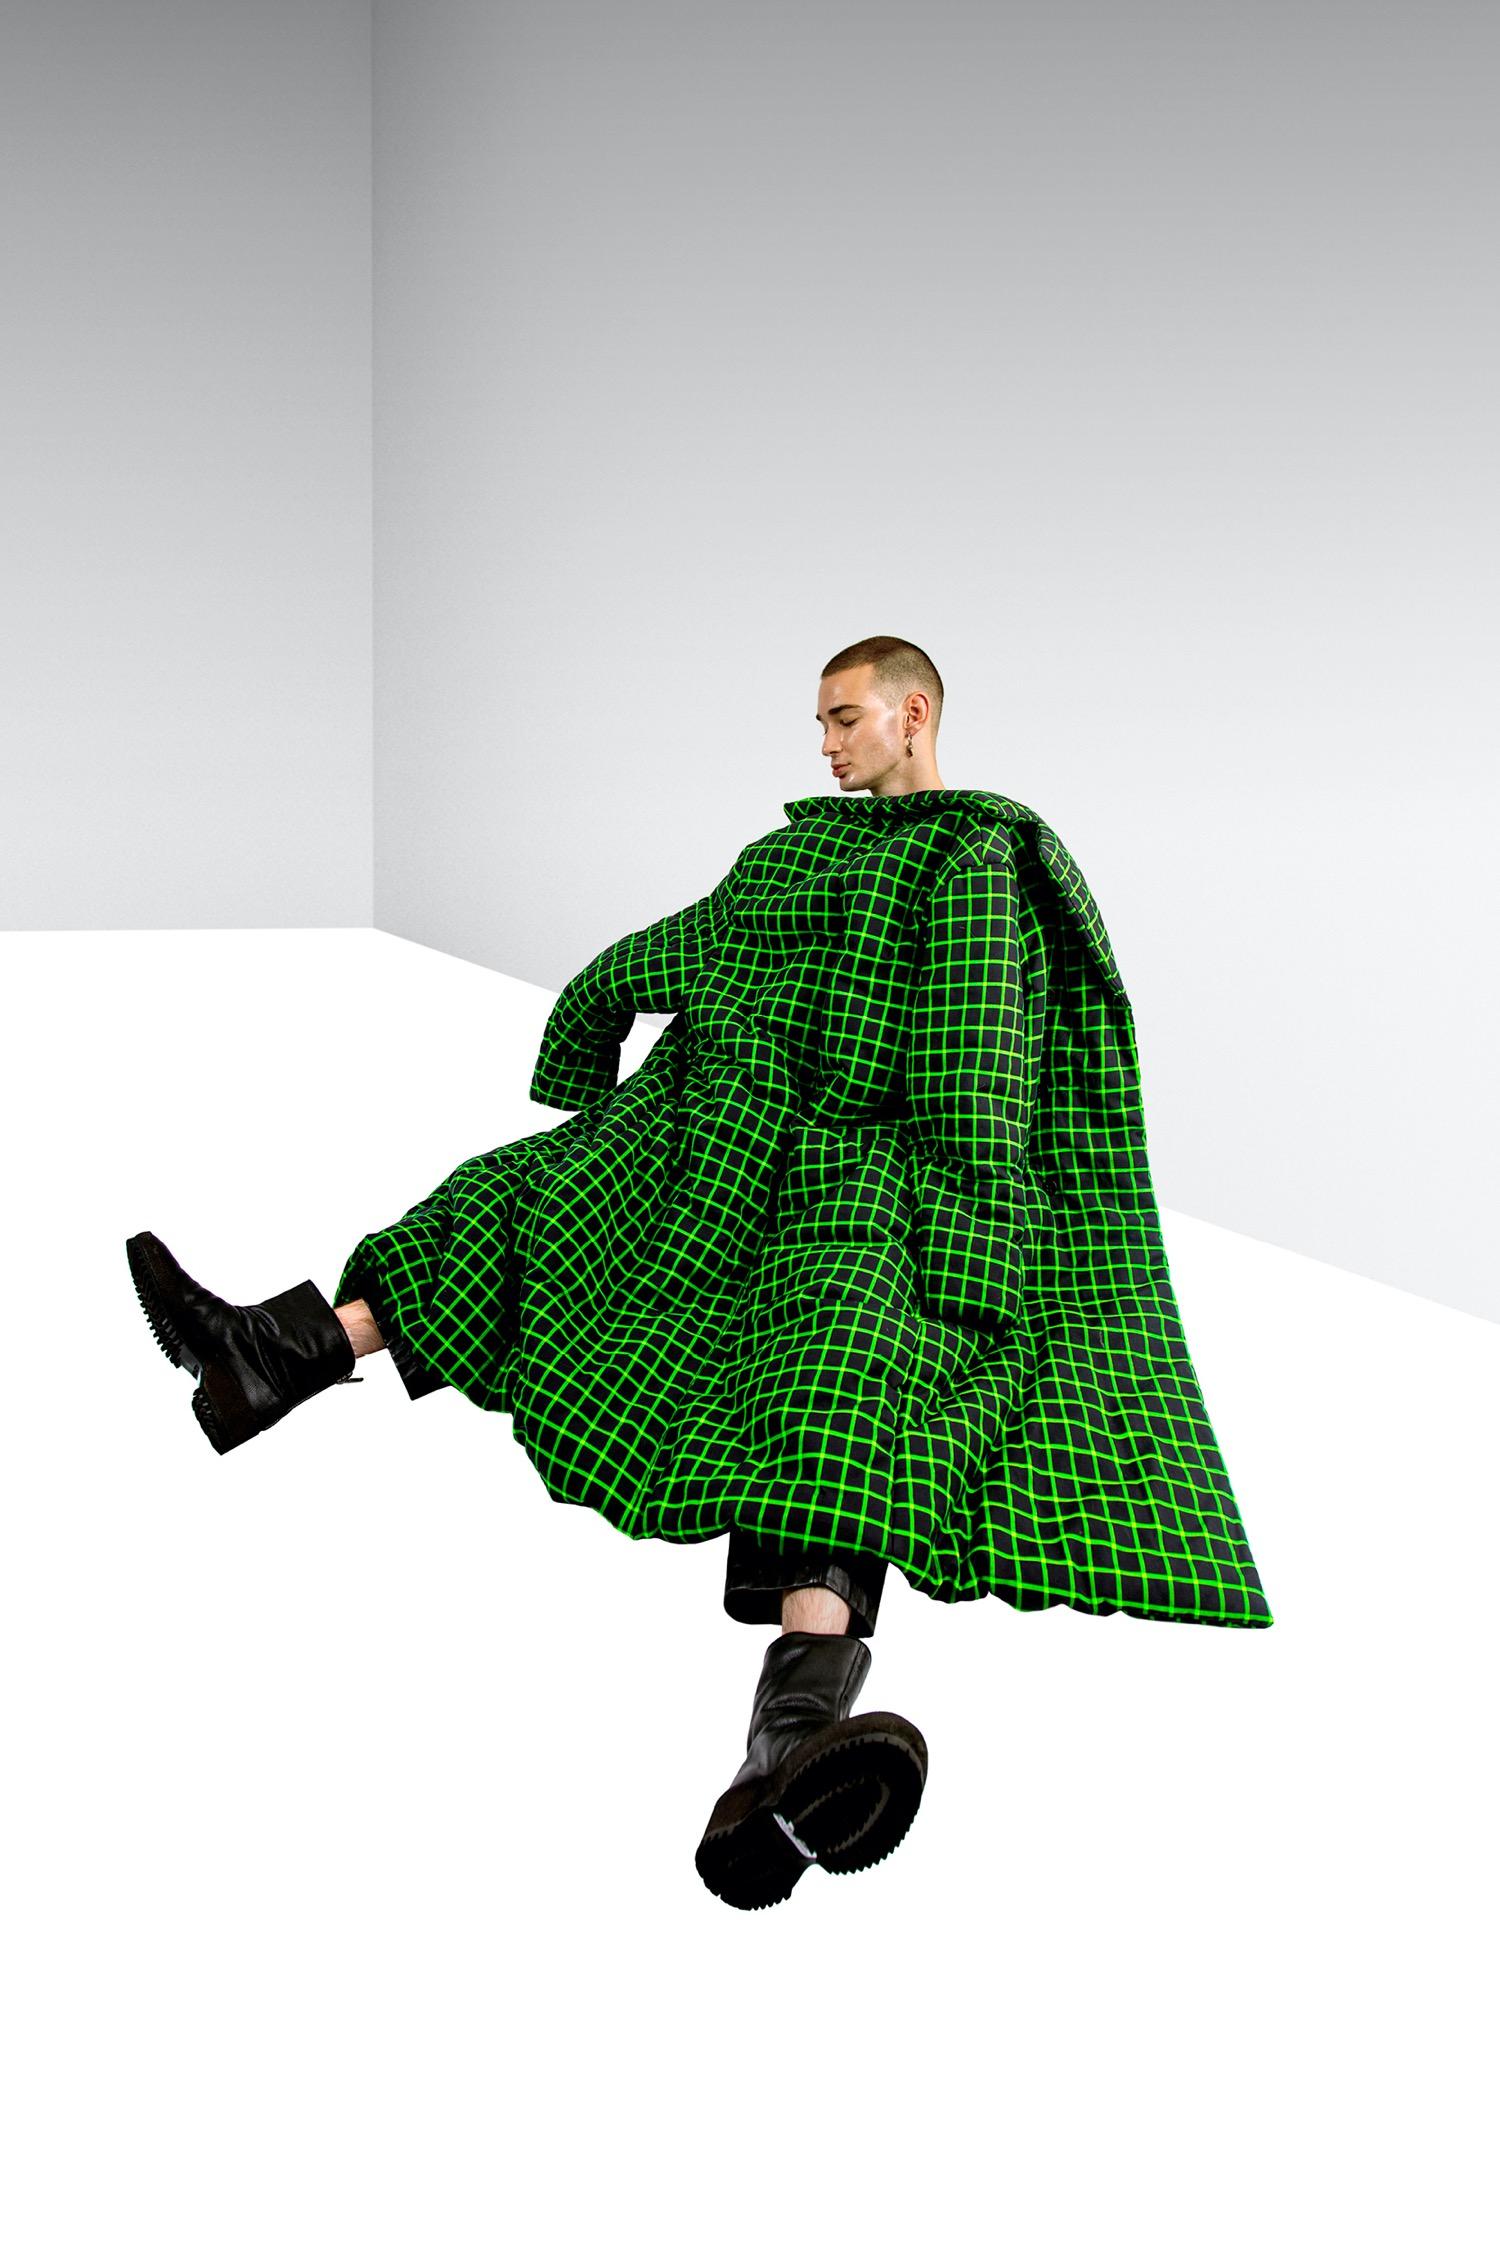 Sicky_kimdary_fashion_photographer-2